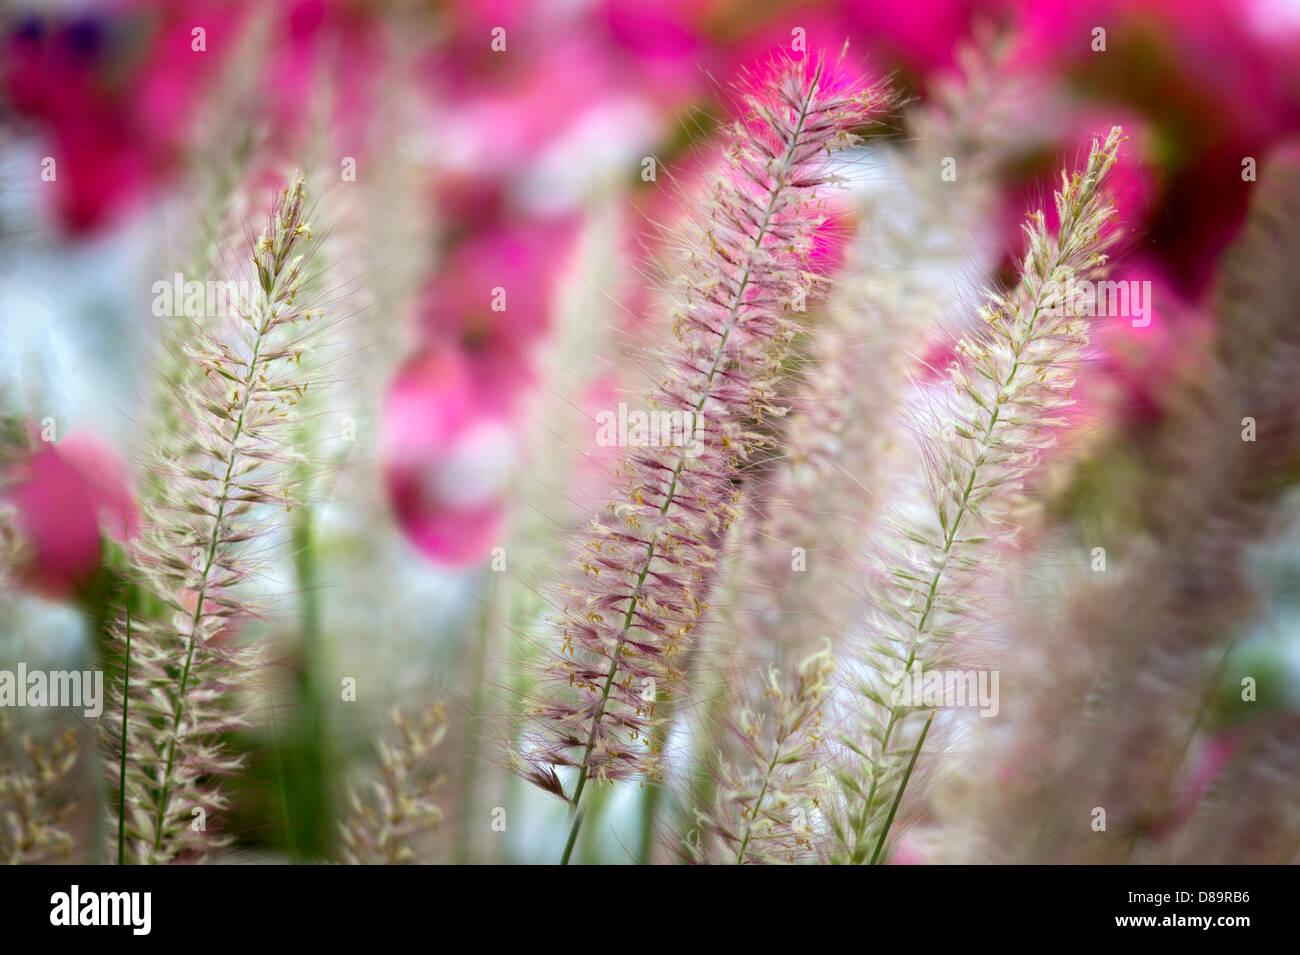 Ornamental grasses and flowers. Palm Desert, California - Stock Image